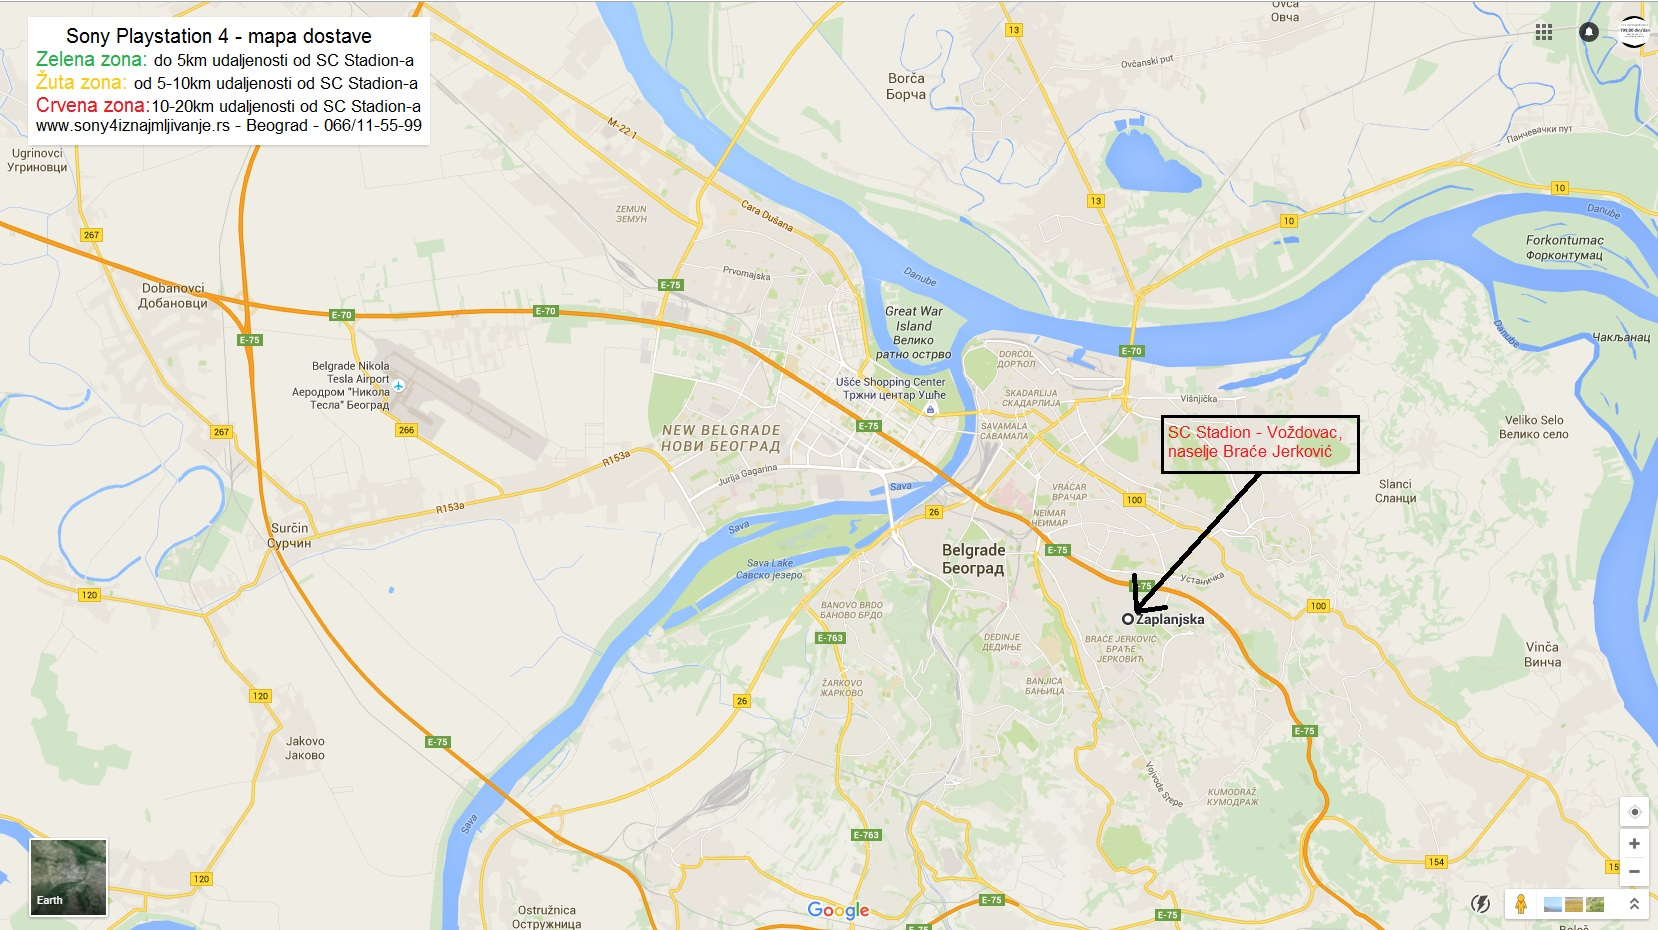 visnjicka banja beograd mapa Dostava Sony Playstation konzola Beograd | Sony 4 iznajmljivanje visnjicka banja beograd mapa